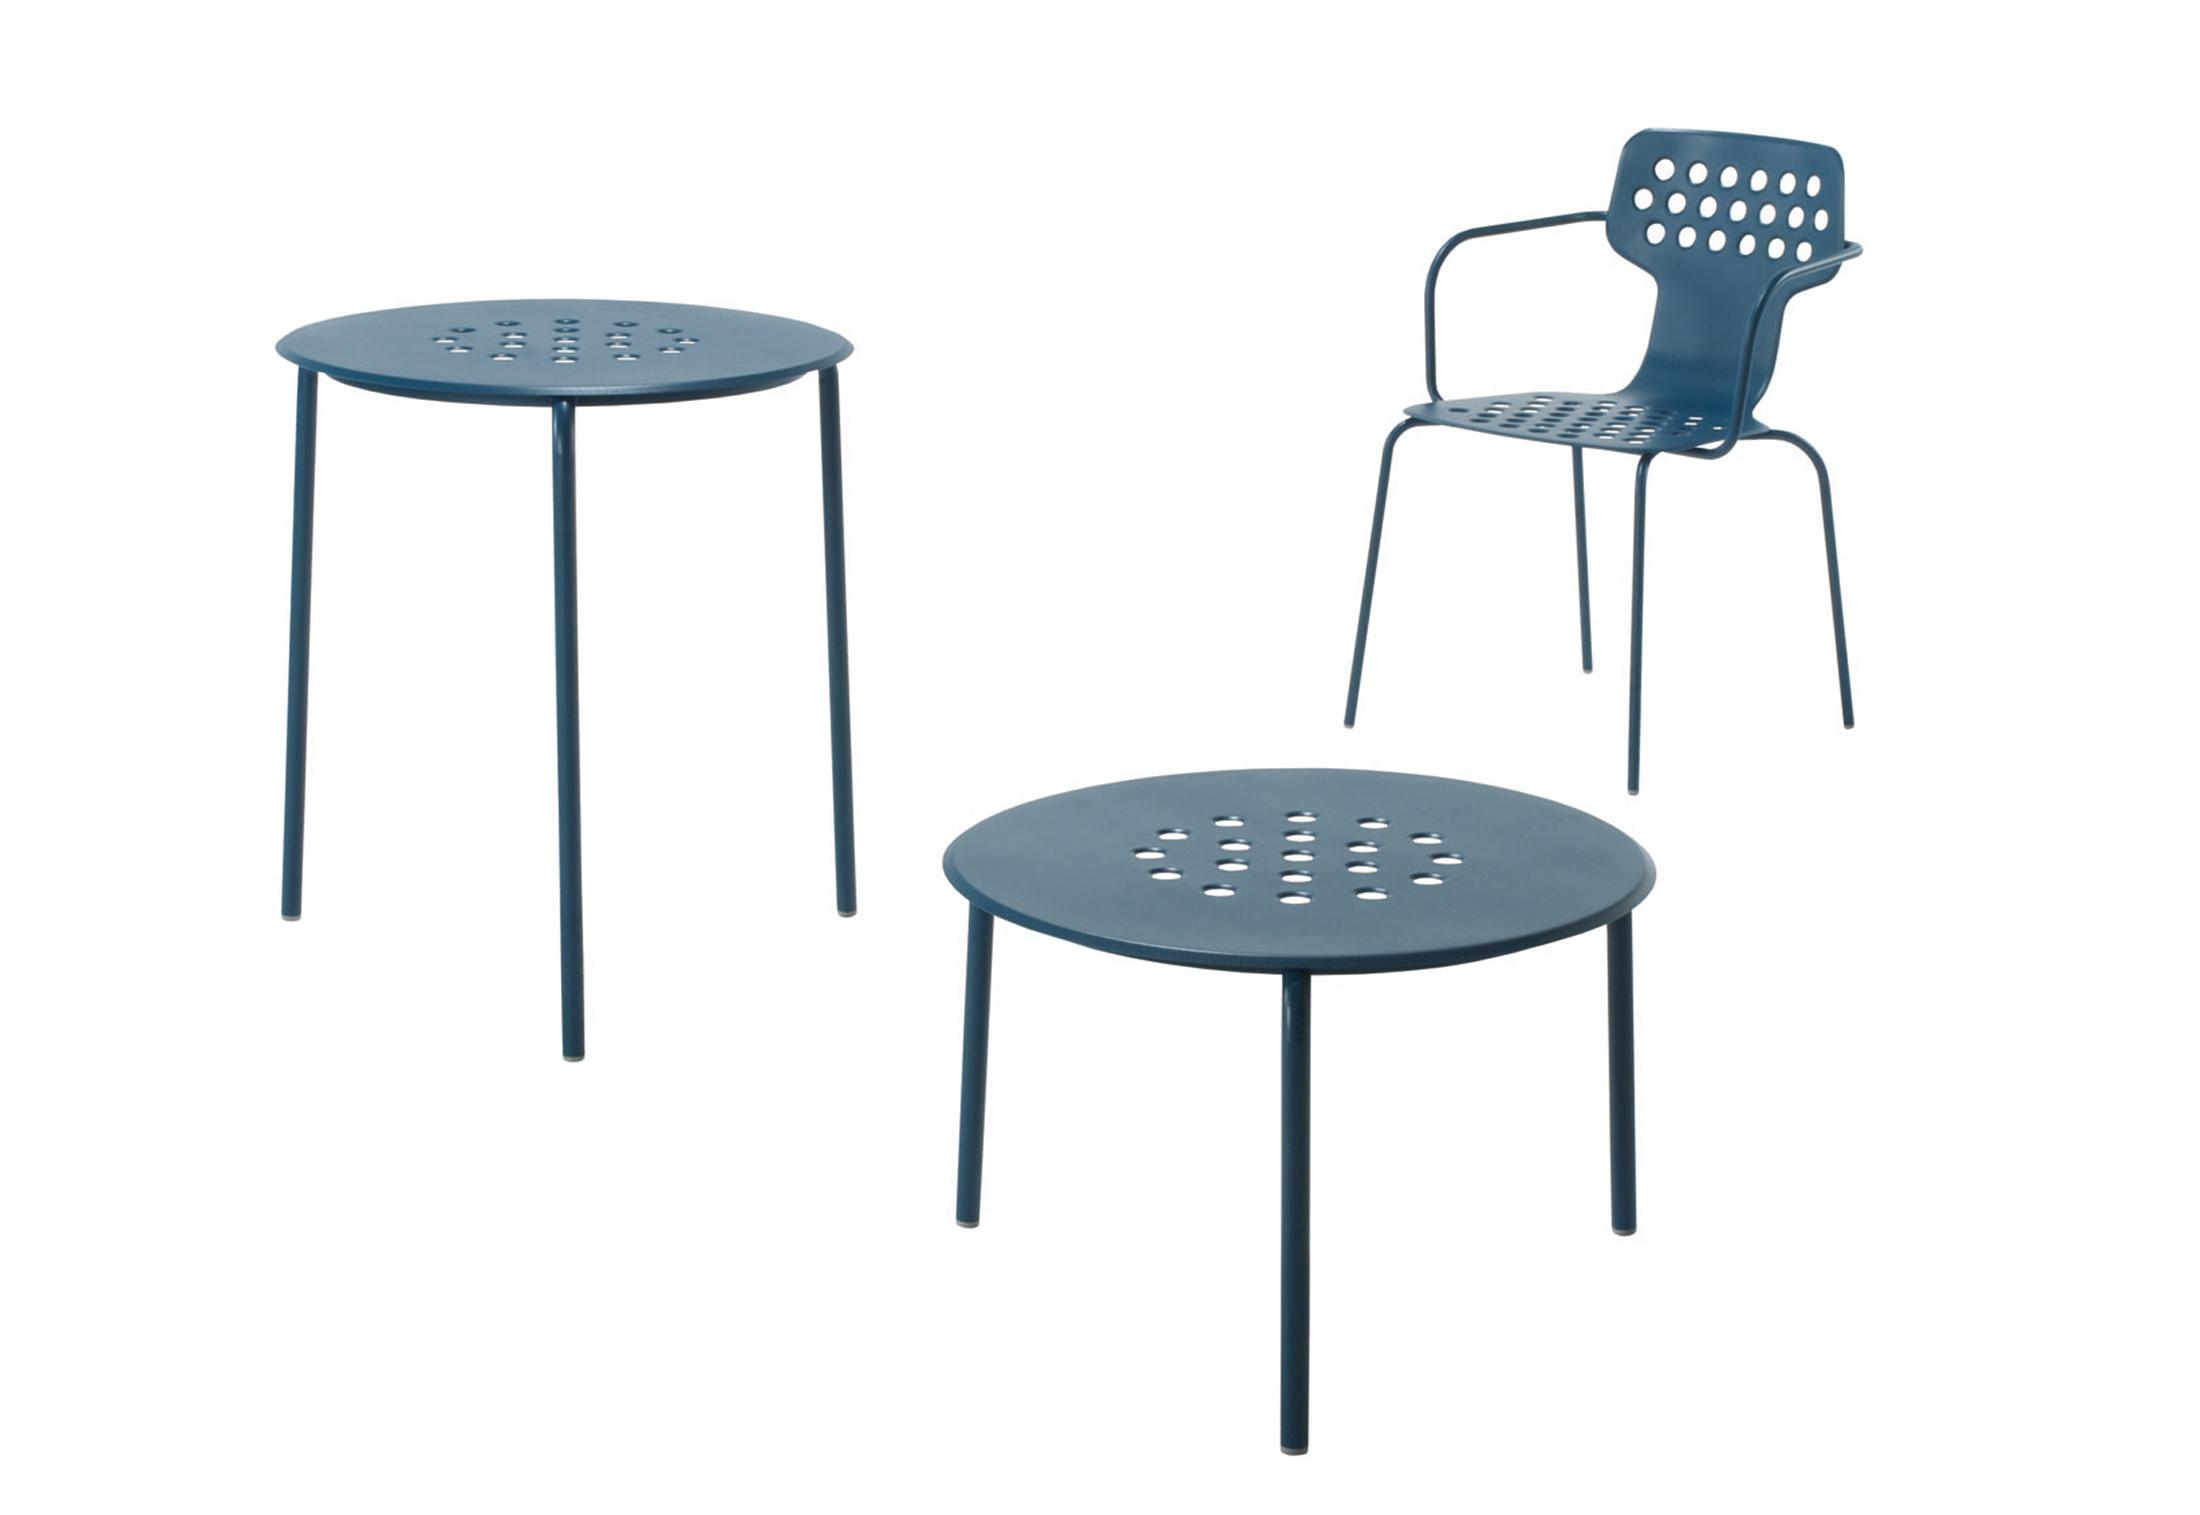 Open Table By Alias STYLEPARK - Oen table